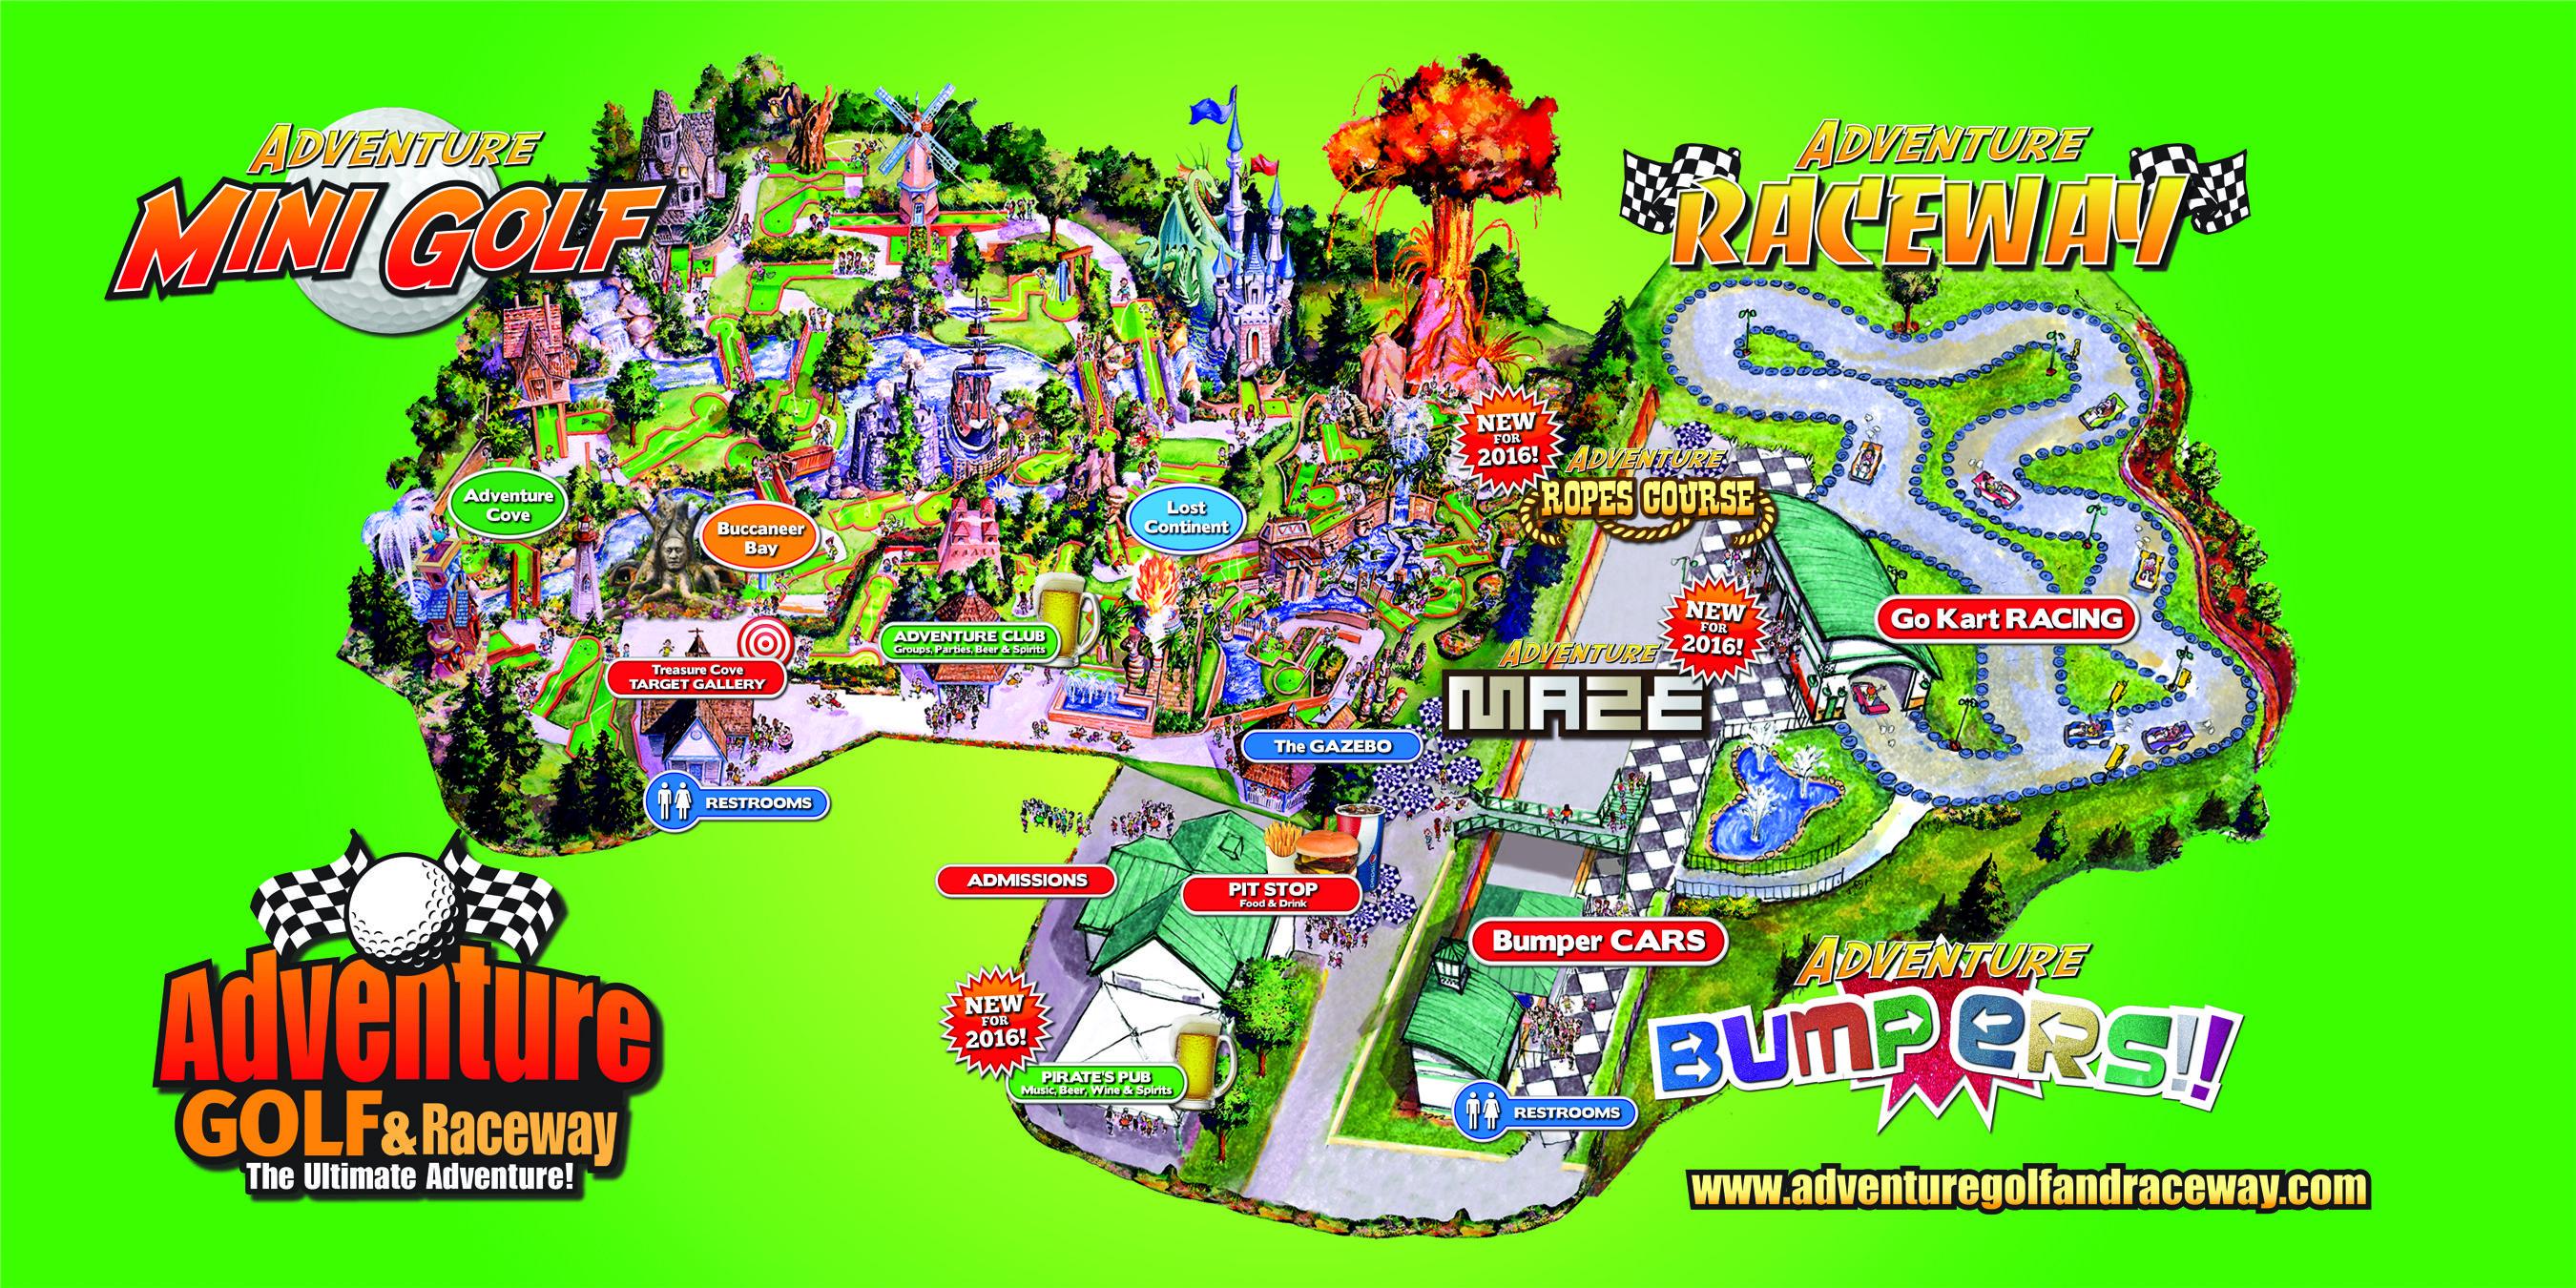 15+ Adventure golf and raceway hours info